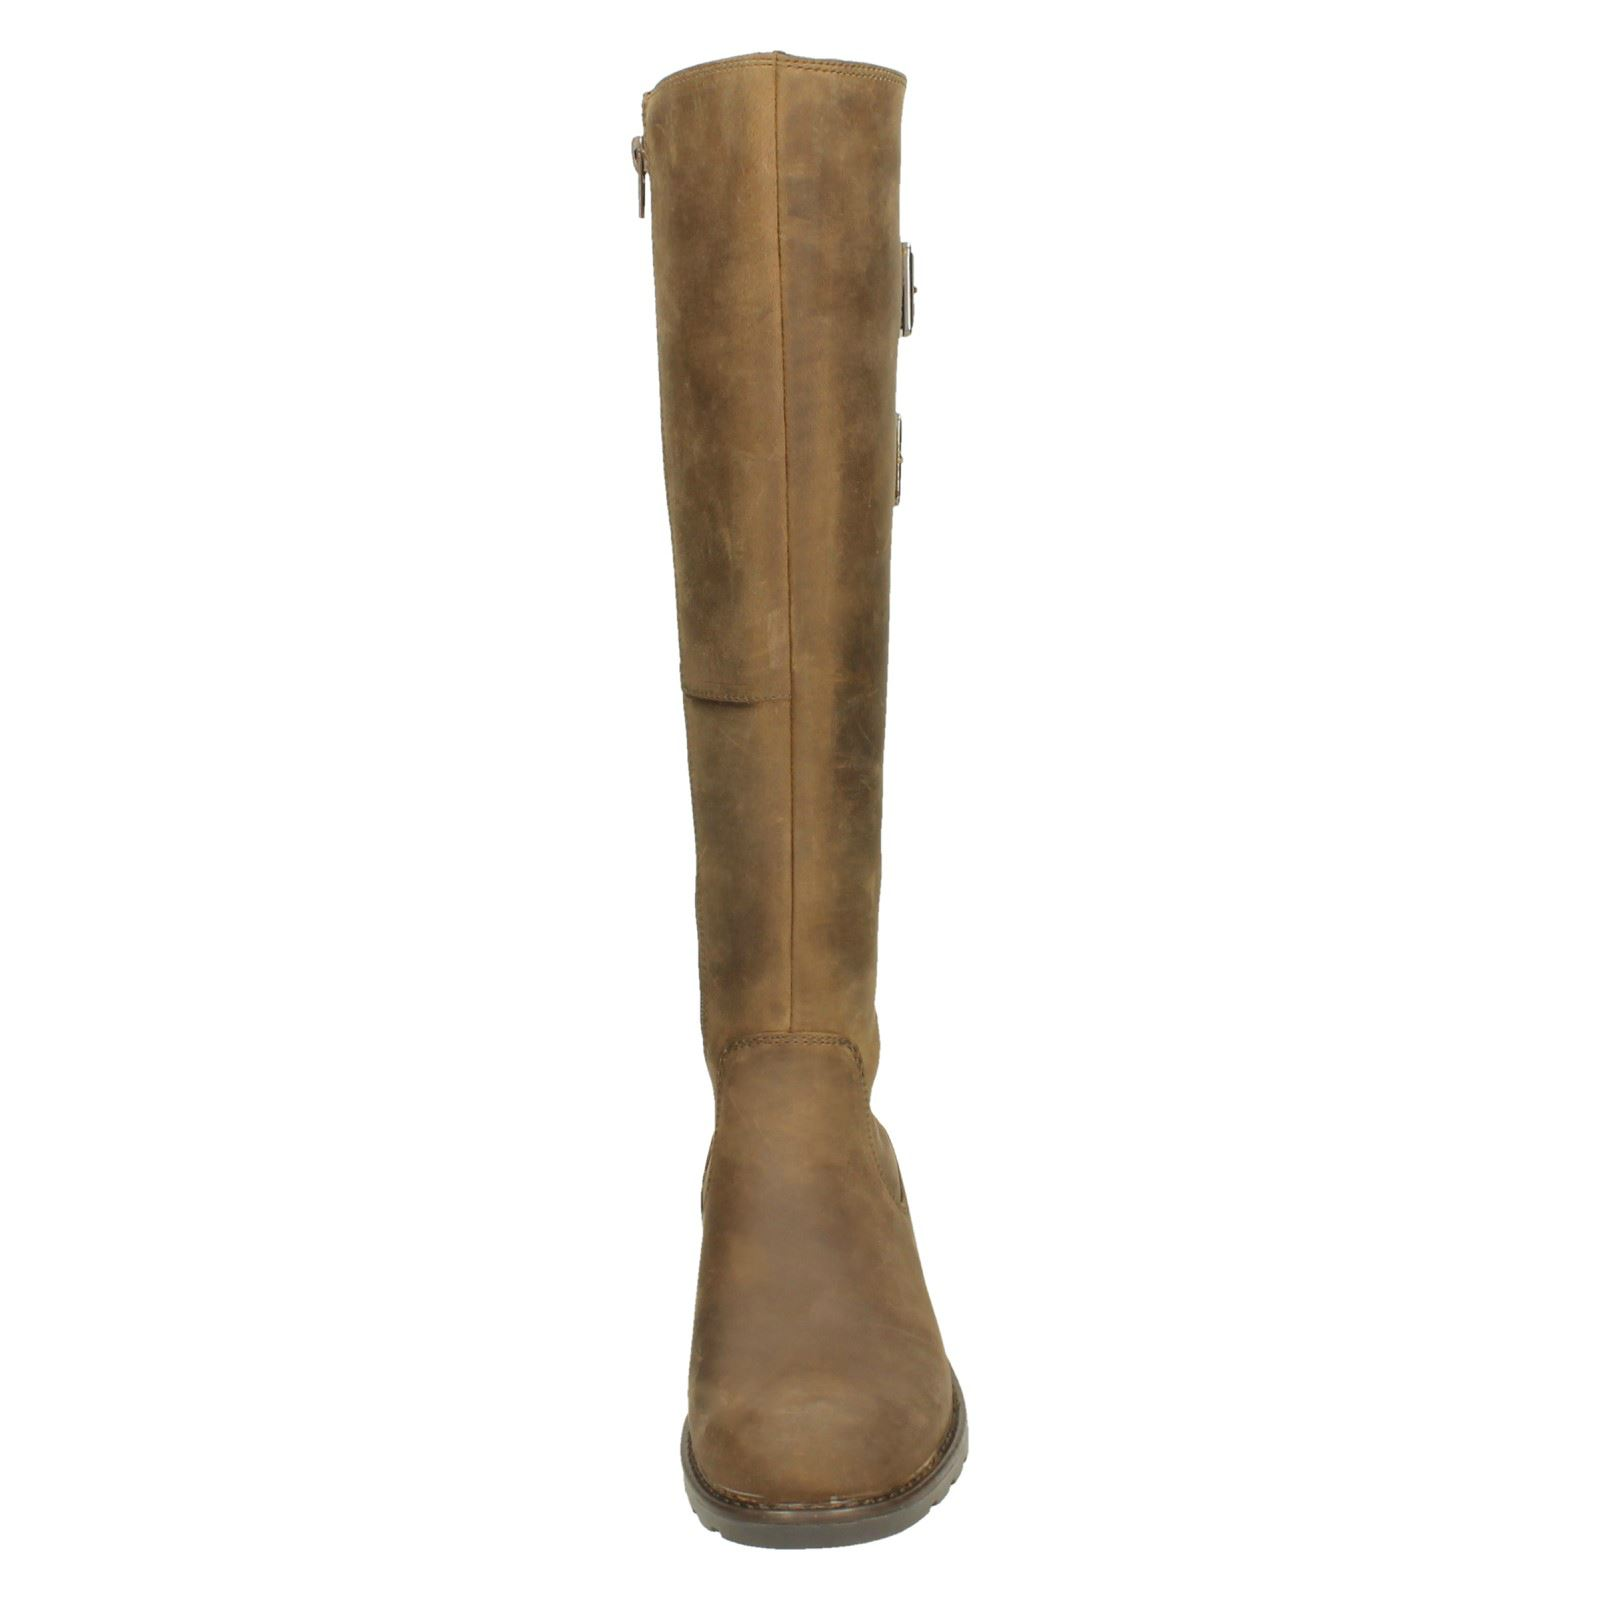 Ladies Ladies Ladies Clarks Orinoco Tango Riding Style Long Boots a19c59